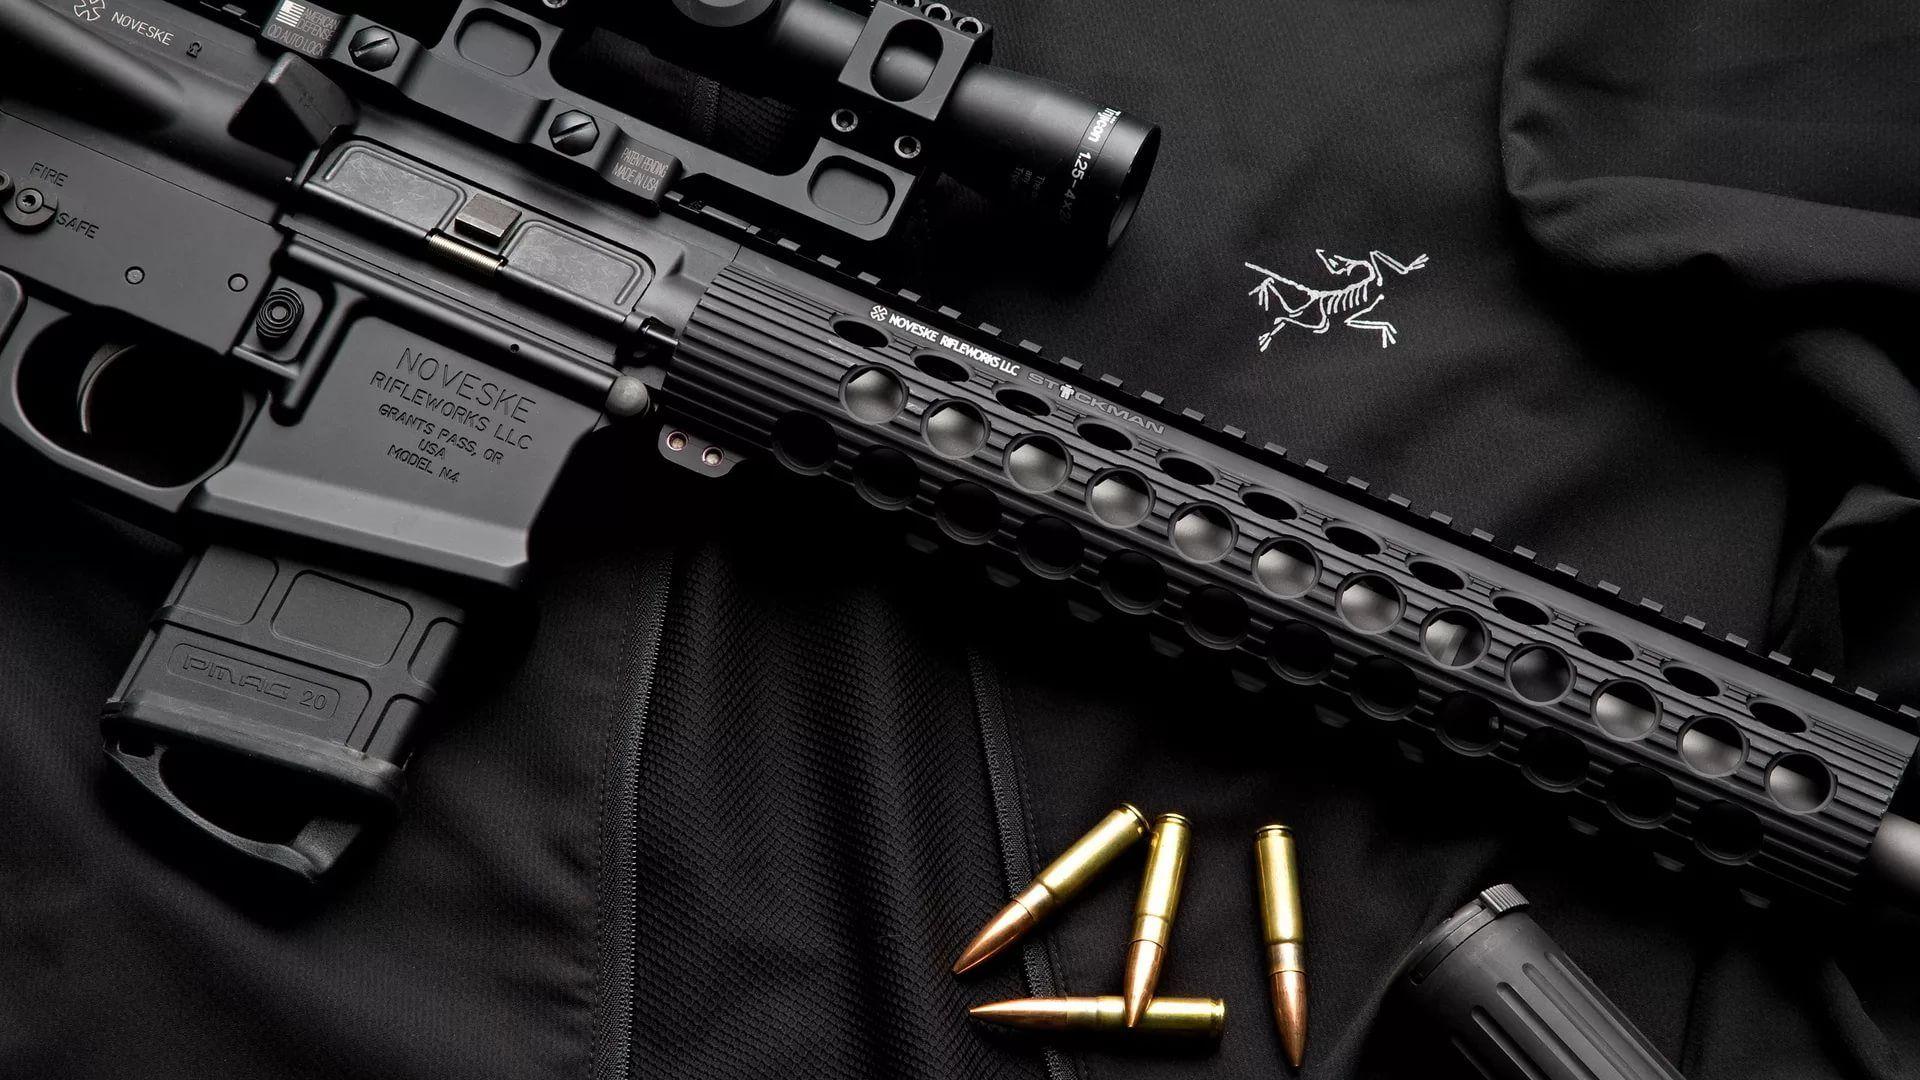 Gun For Desktop Picture